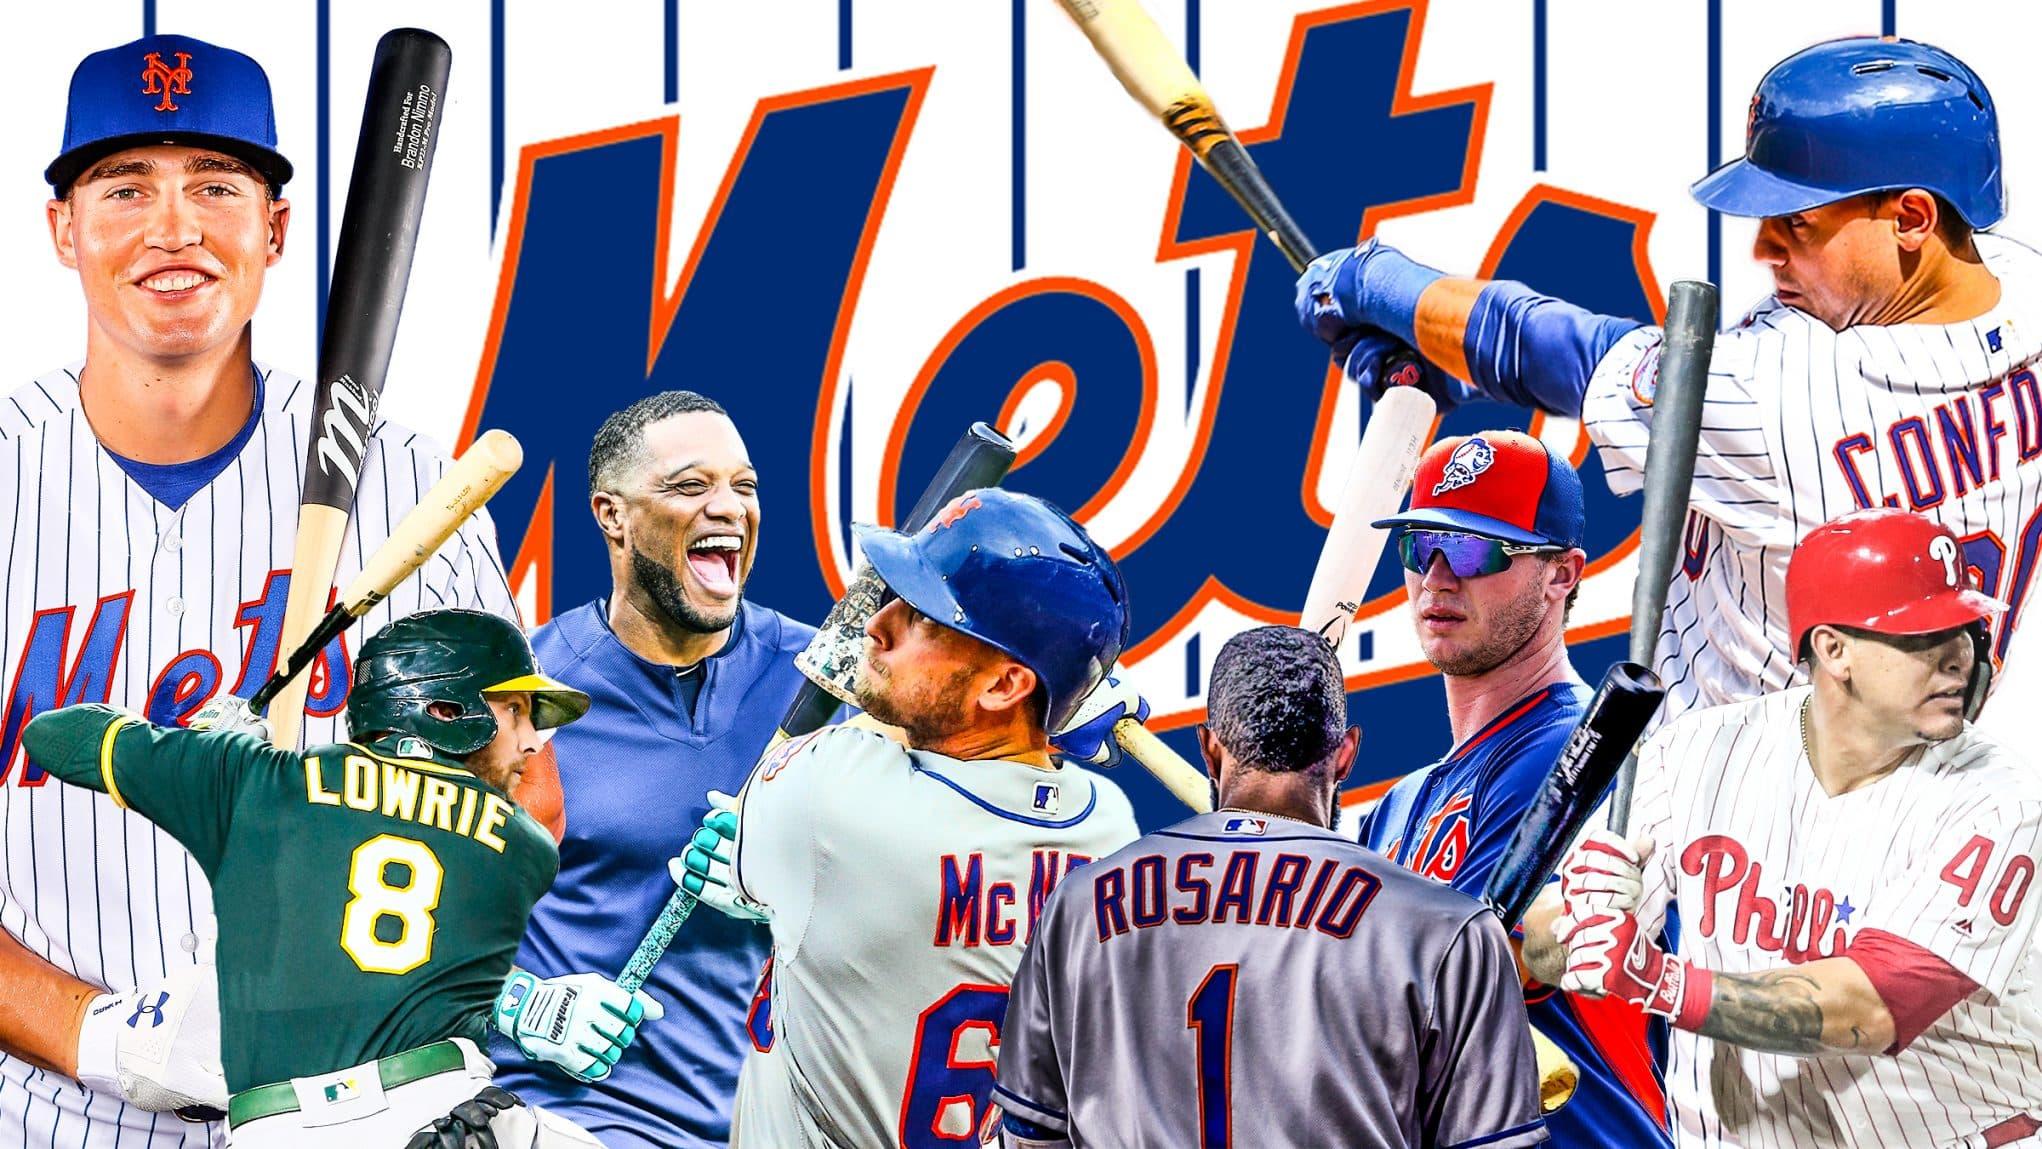 New York Mets 2019 lineup: Breaking down the RHP, LHP